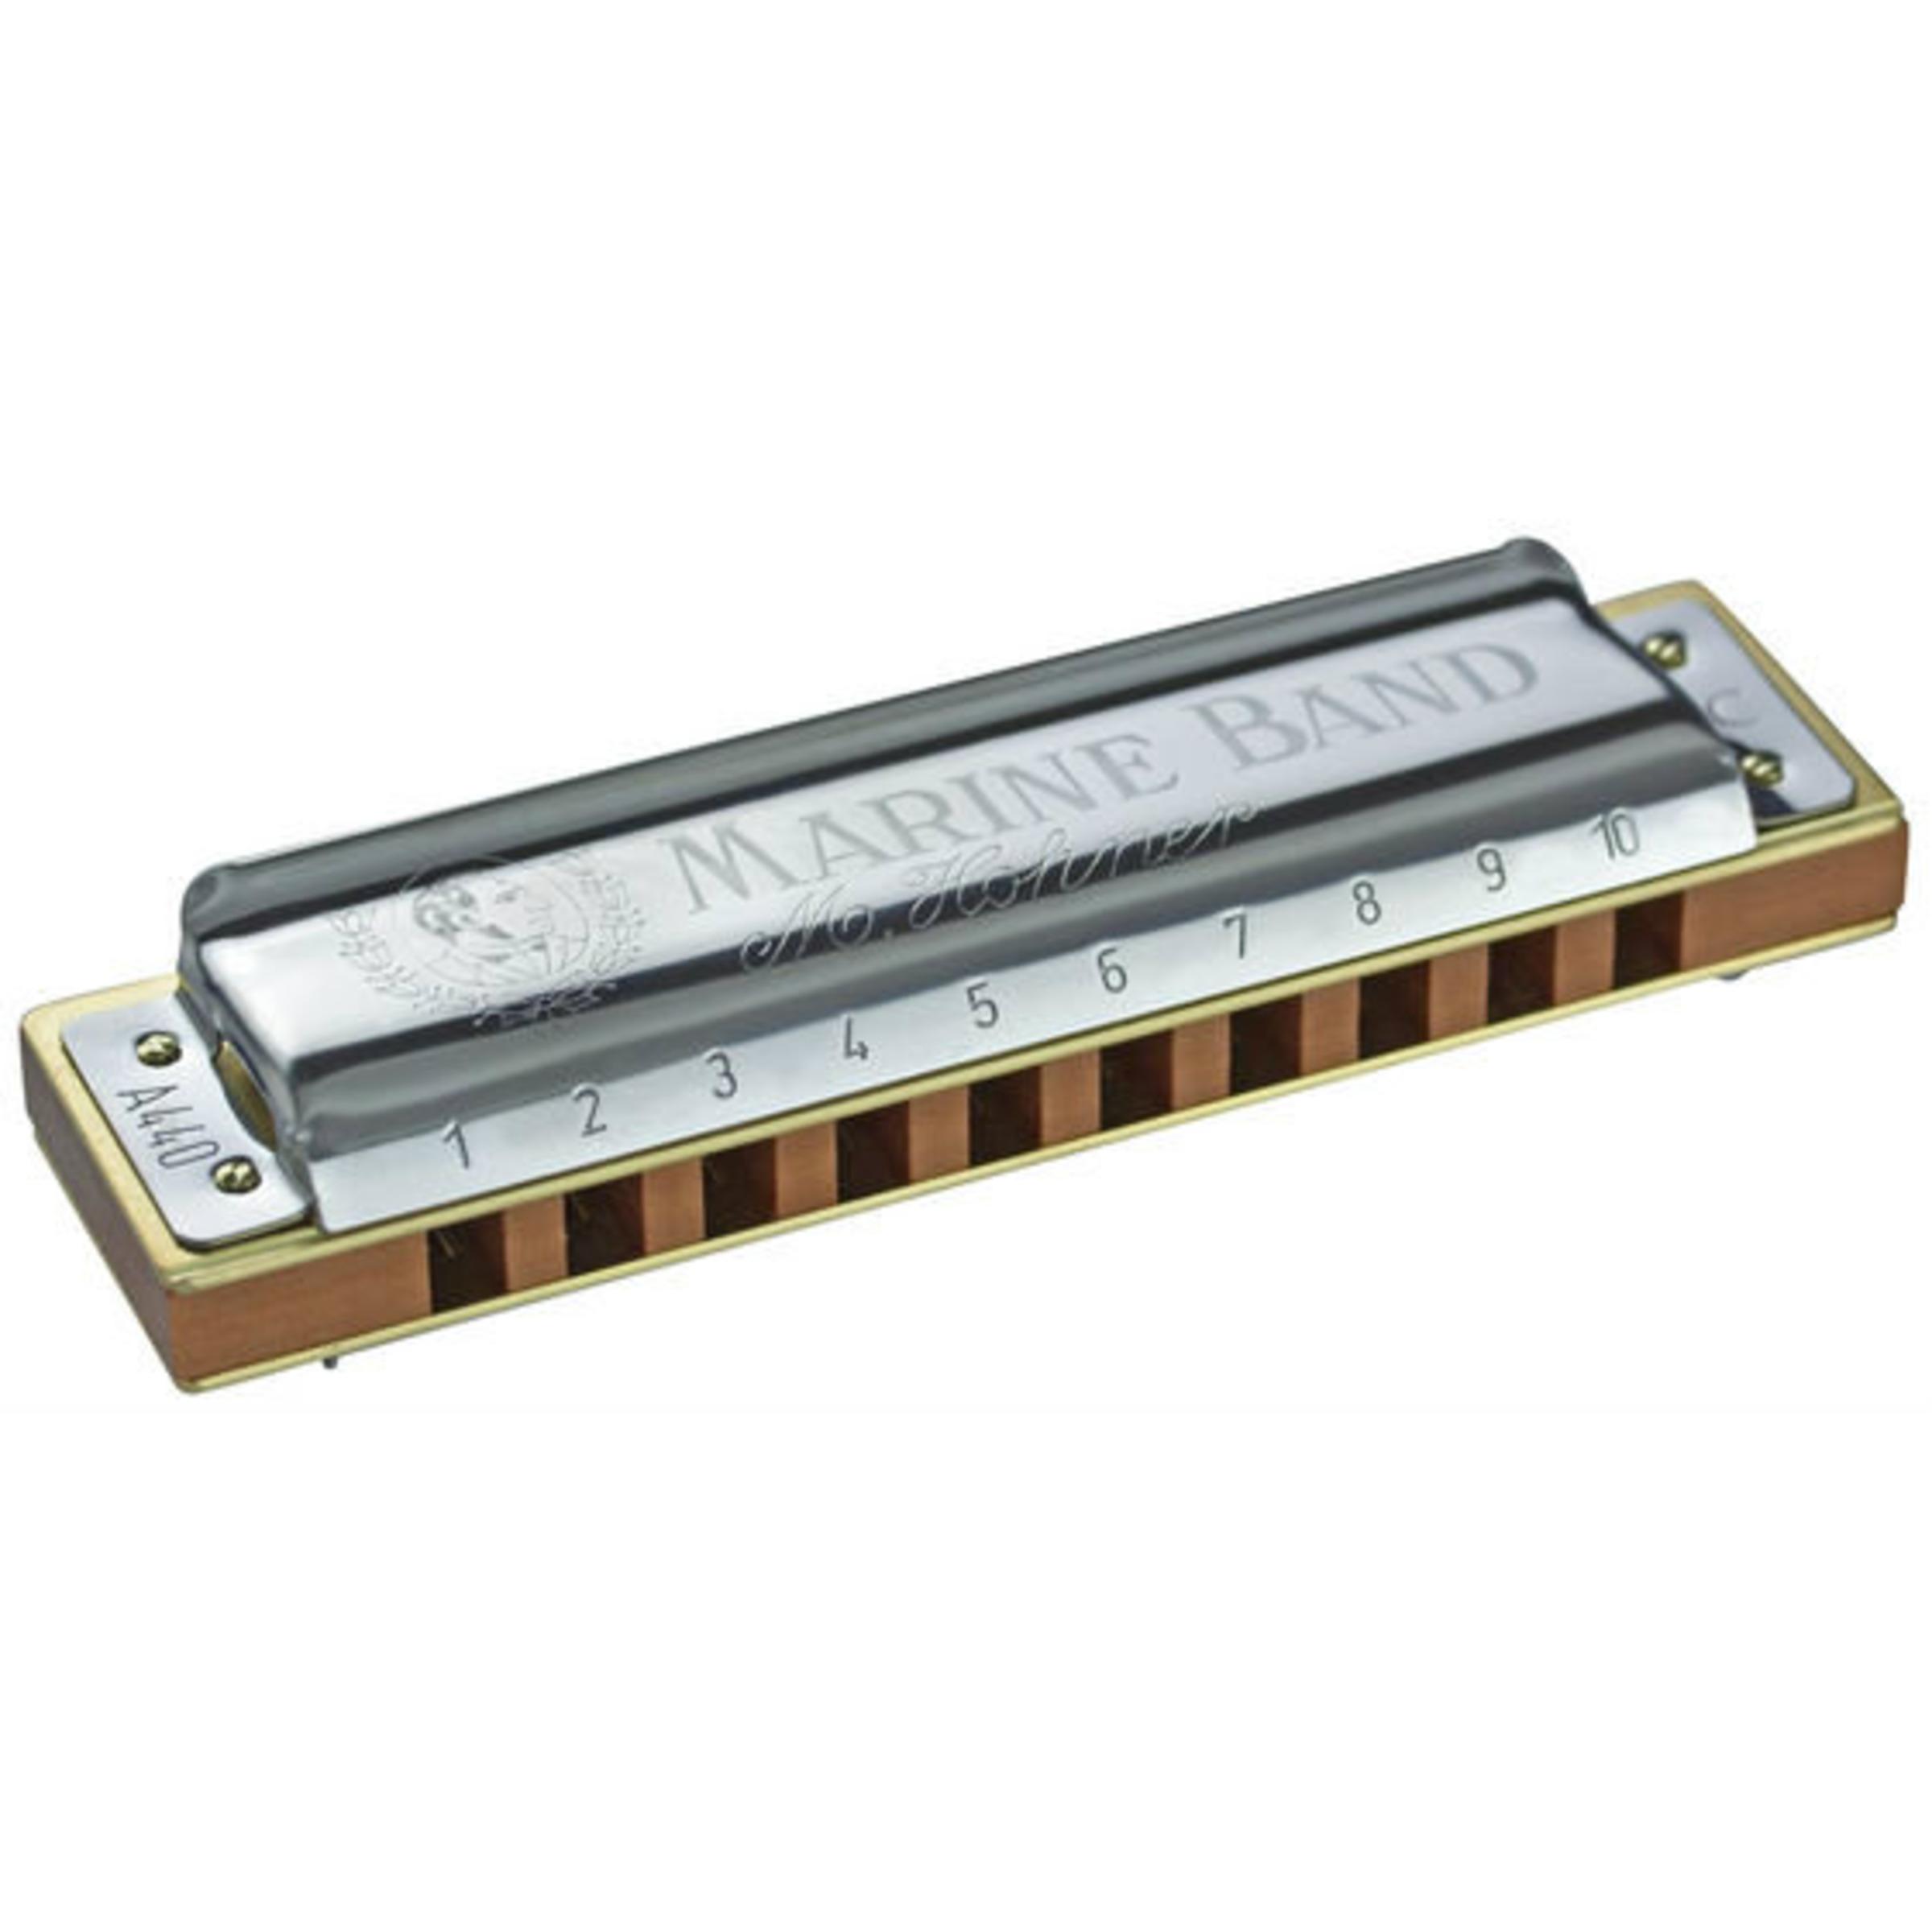 hohner marine band 1896 classic harmonica giggear. Black Bedroom Furniture Sets. Home Design Ideas